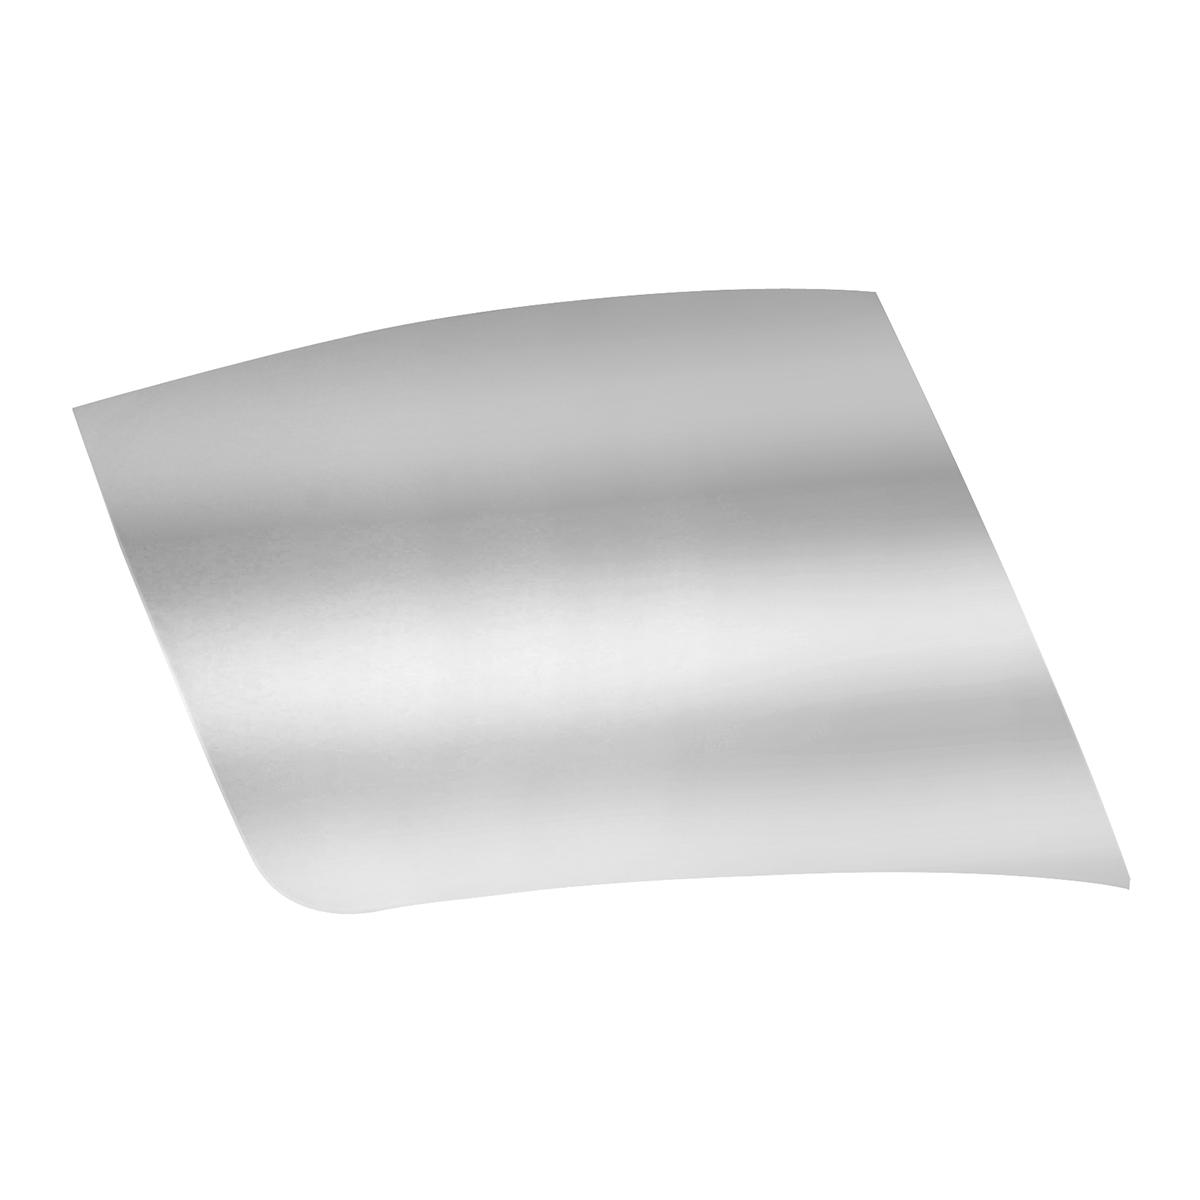 89322 Chrome Plastic Front Bumper Cover (Driver Side) for Volvo VNL